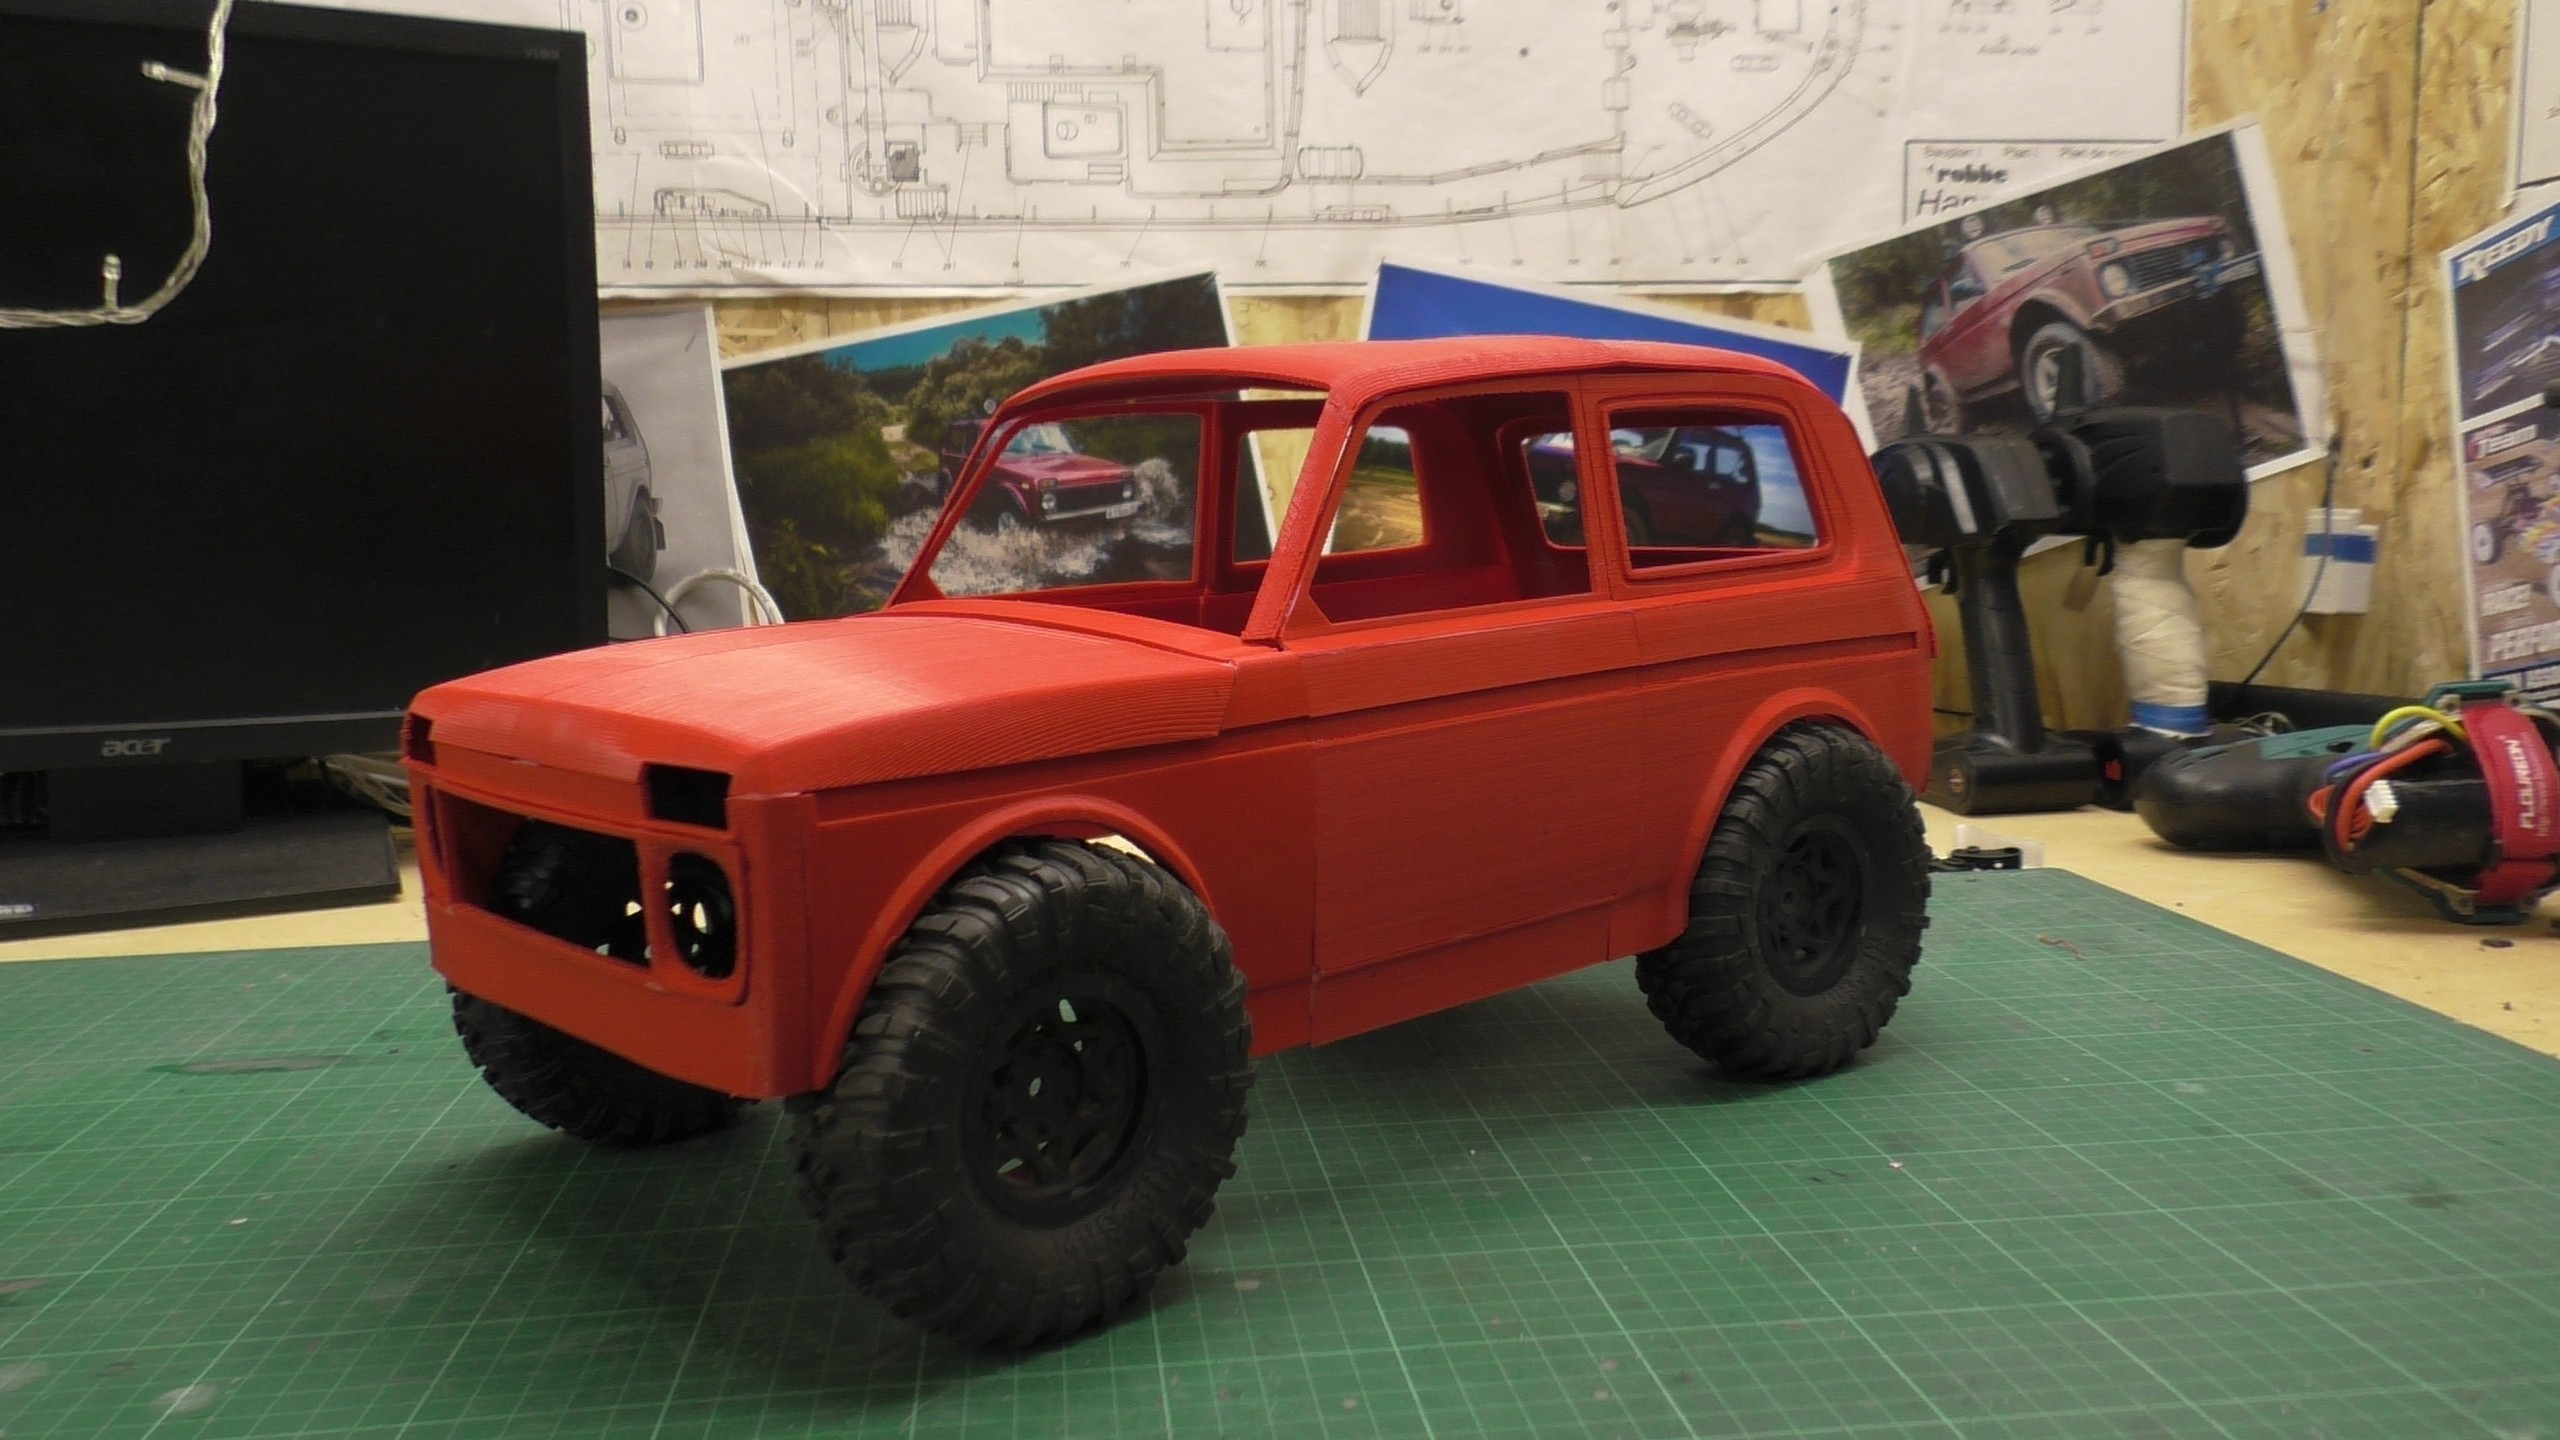 4xrAyn5iDhE.jpg Download STL file Lada Niva  • 3D printing template, serega1337